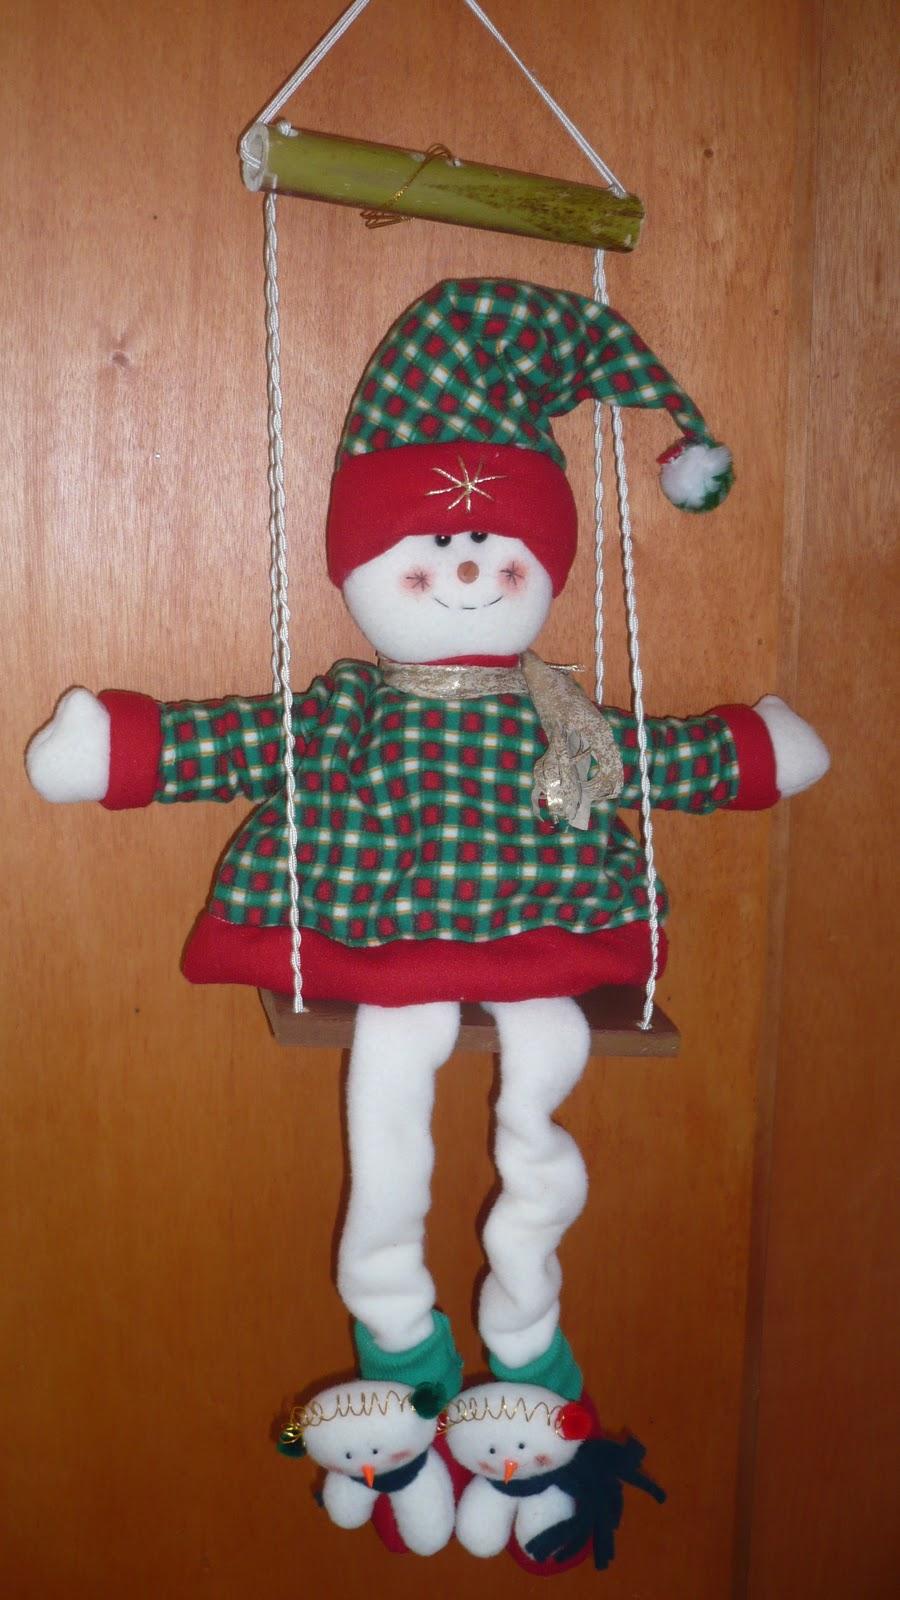 Adornos de navidad columpio nieve en madera - Adornos navidenos de madera ...